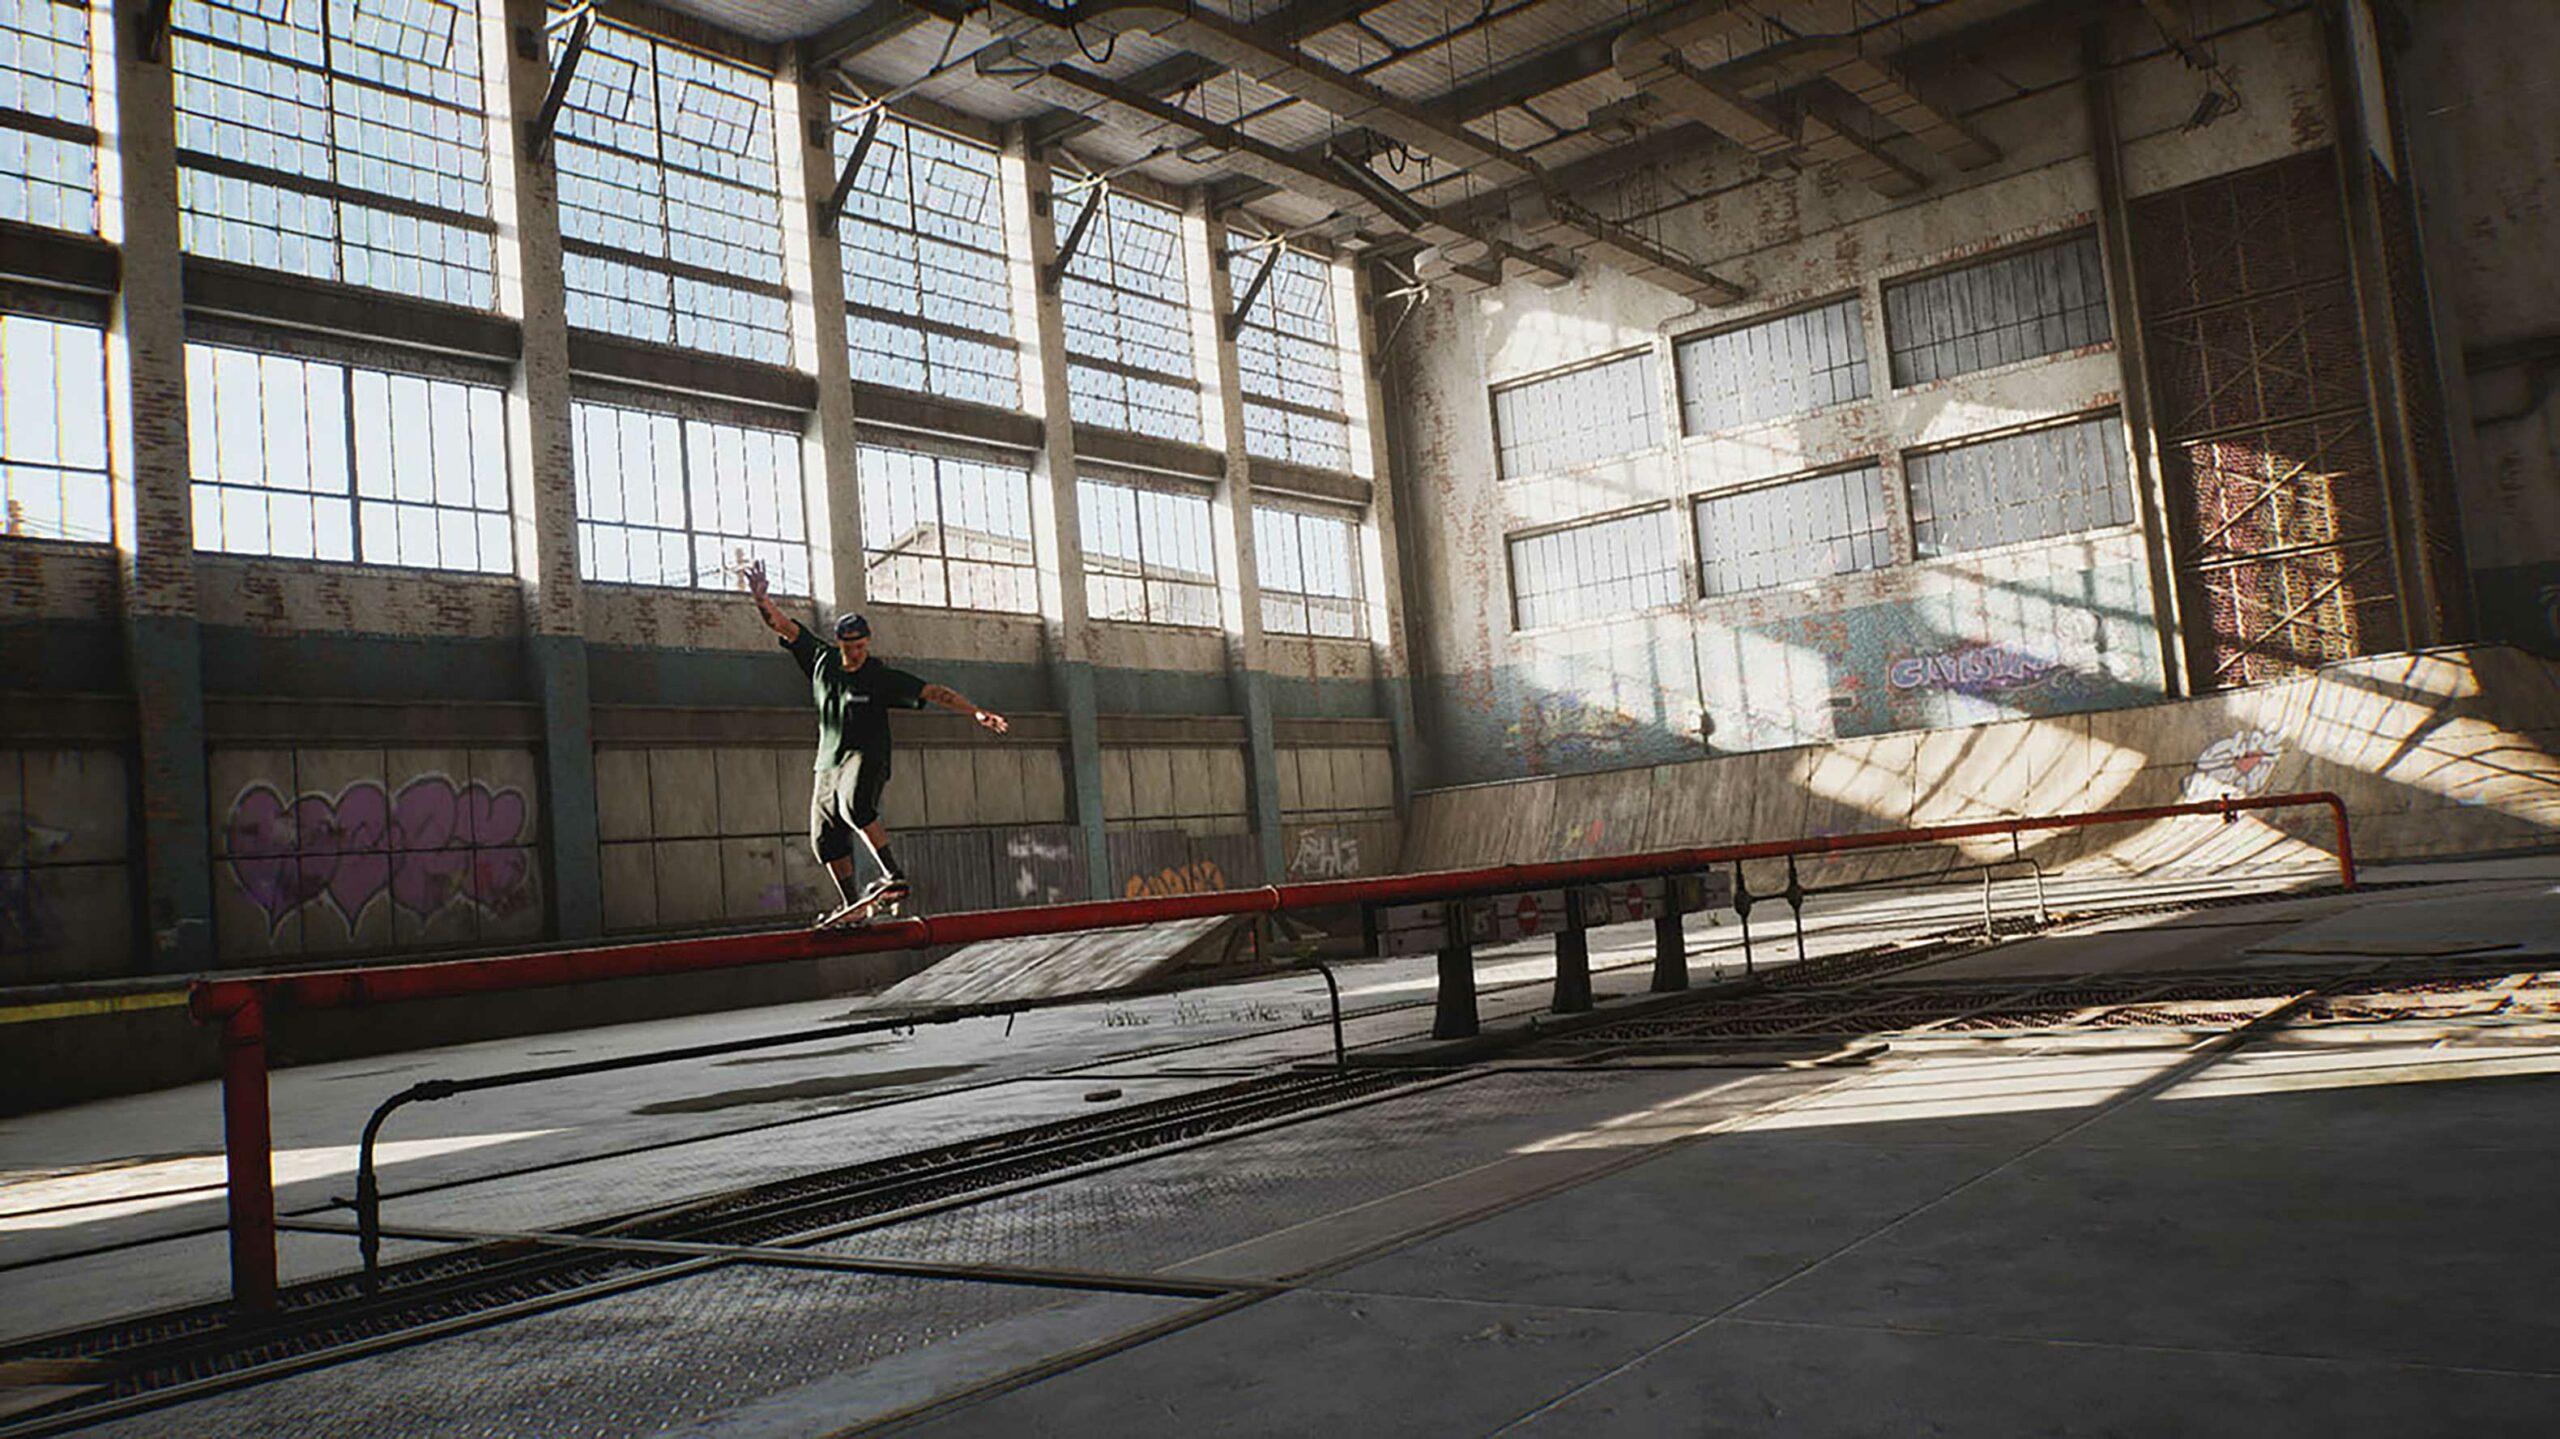 Tony Hawk's Pro Skater 1+2 HD